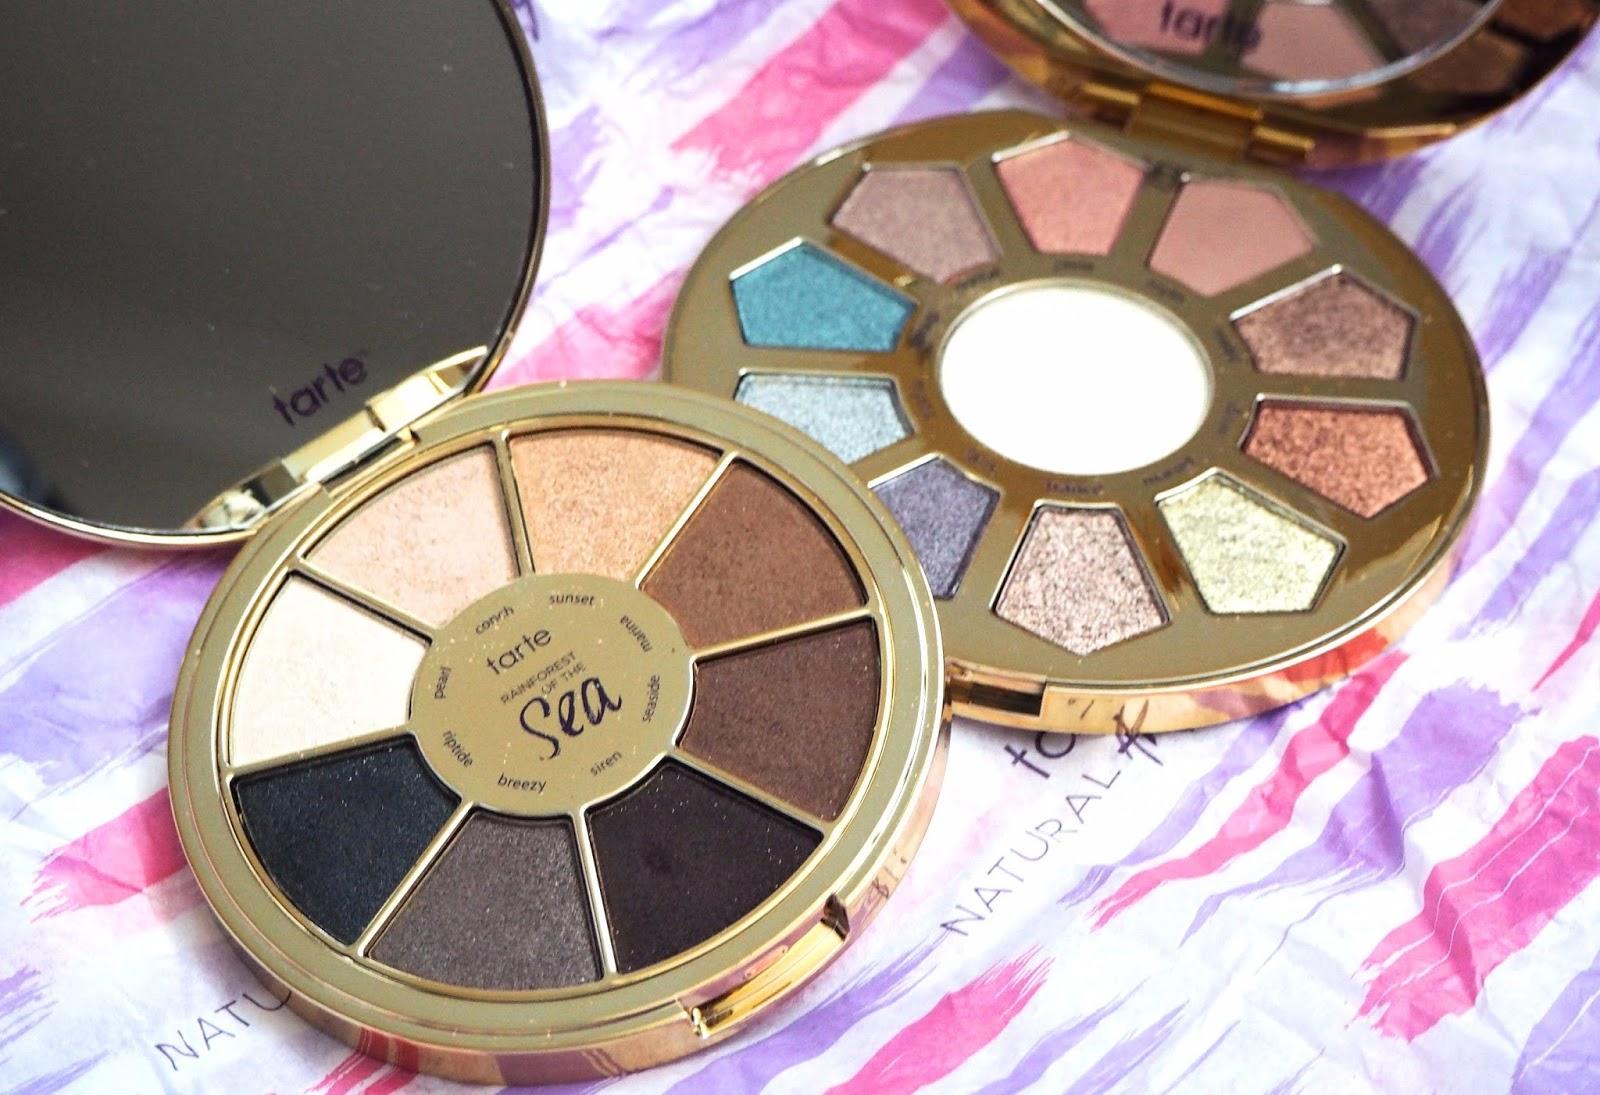 Tarte Eyeshadow Palettes